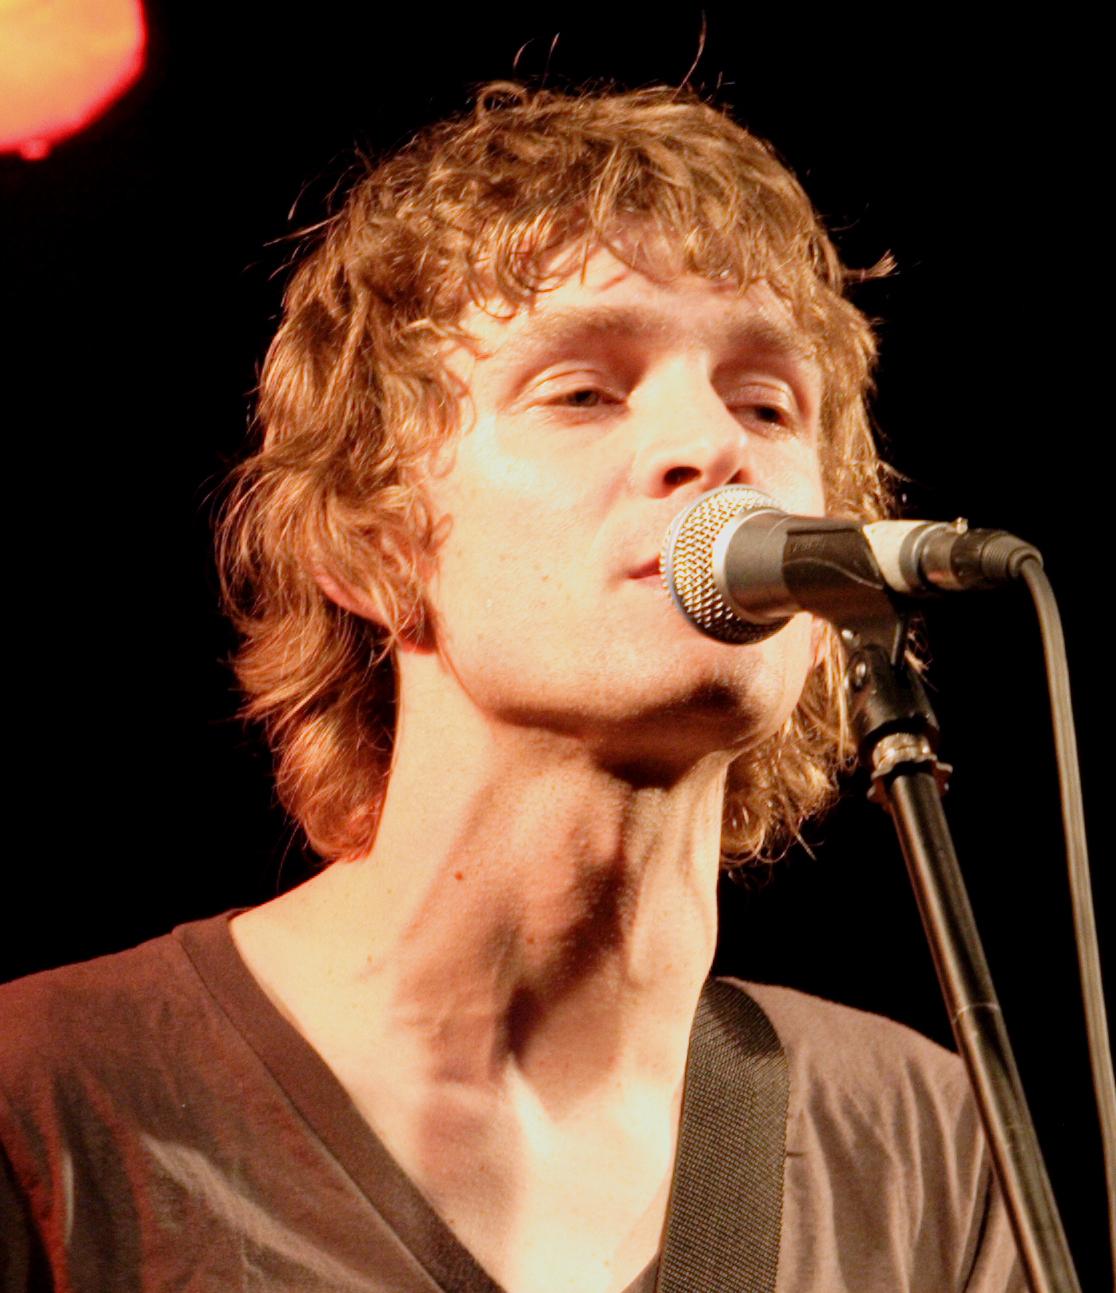 Brendan Benson has announced the reissue of his debut album One Mississippi